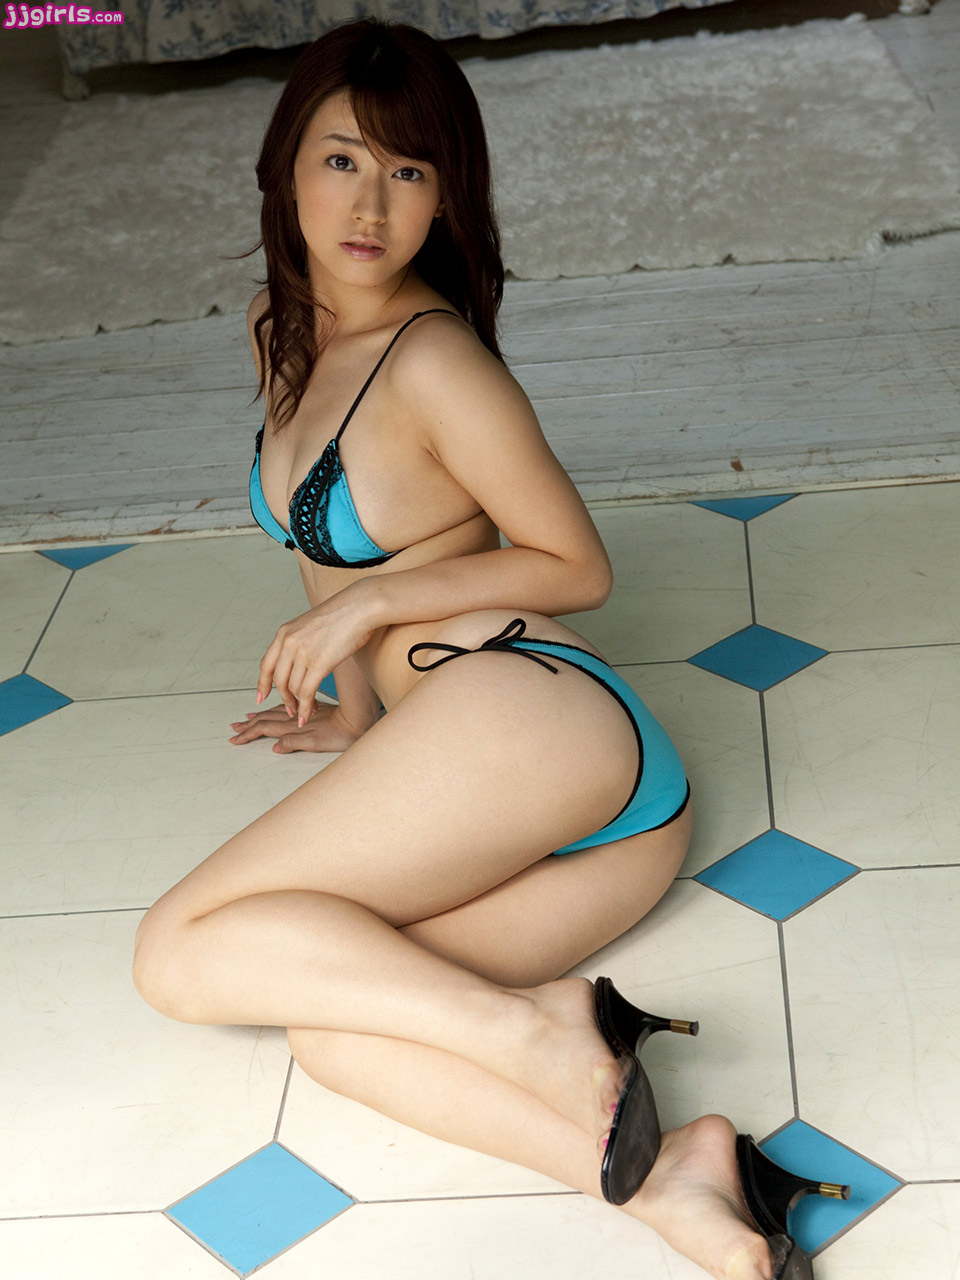 porn mobile 3gp